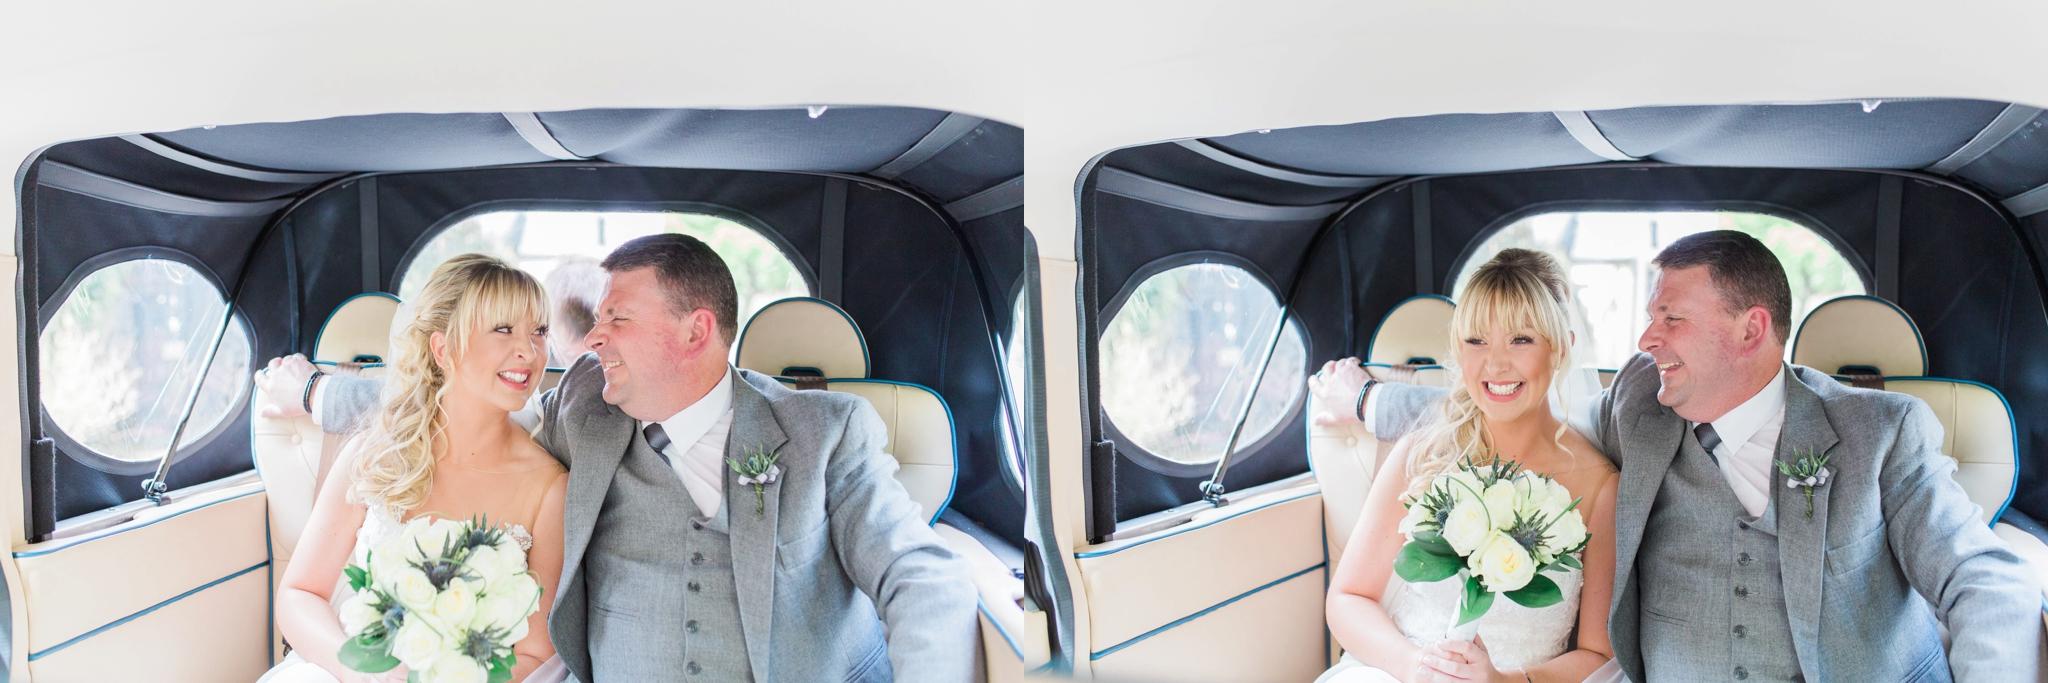 Suzanne_li_photography_Roman_camp_wedding_0011.jpg